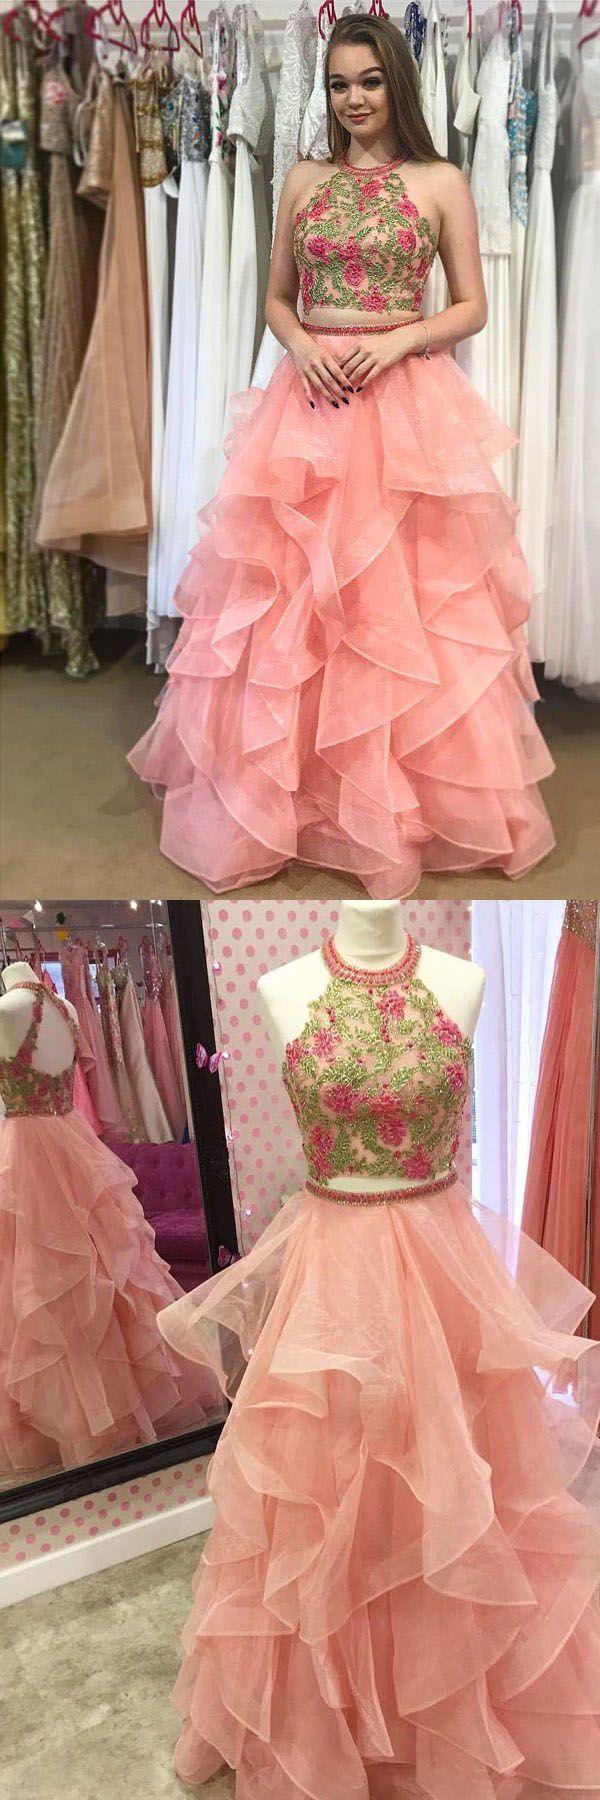 23 best Vestidos de novia images on Pinterest | Wedding frocks ...